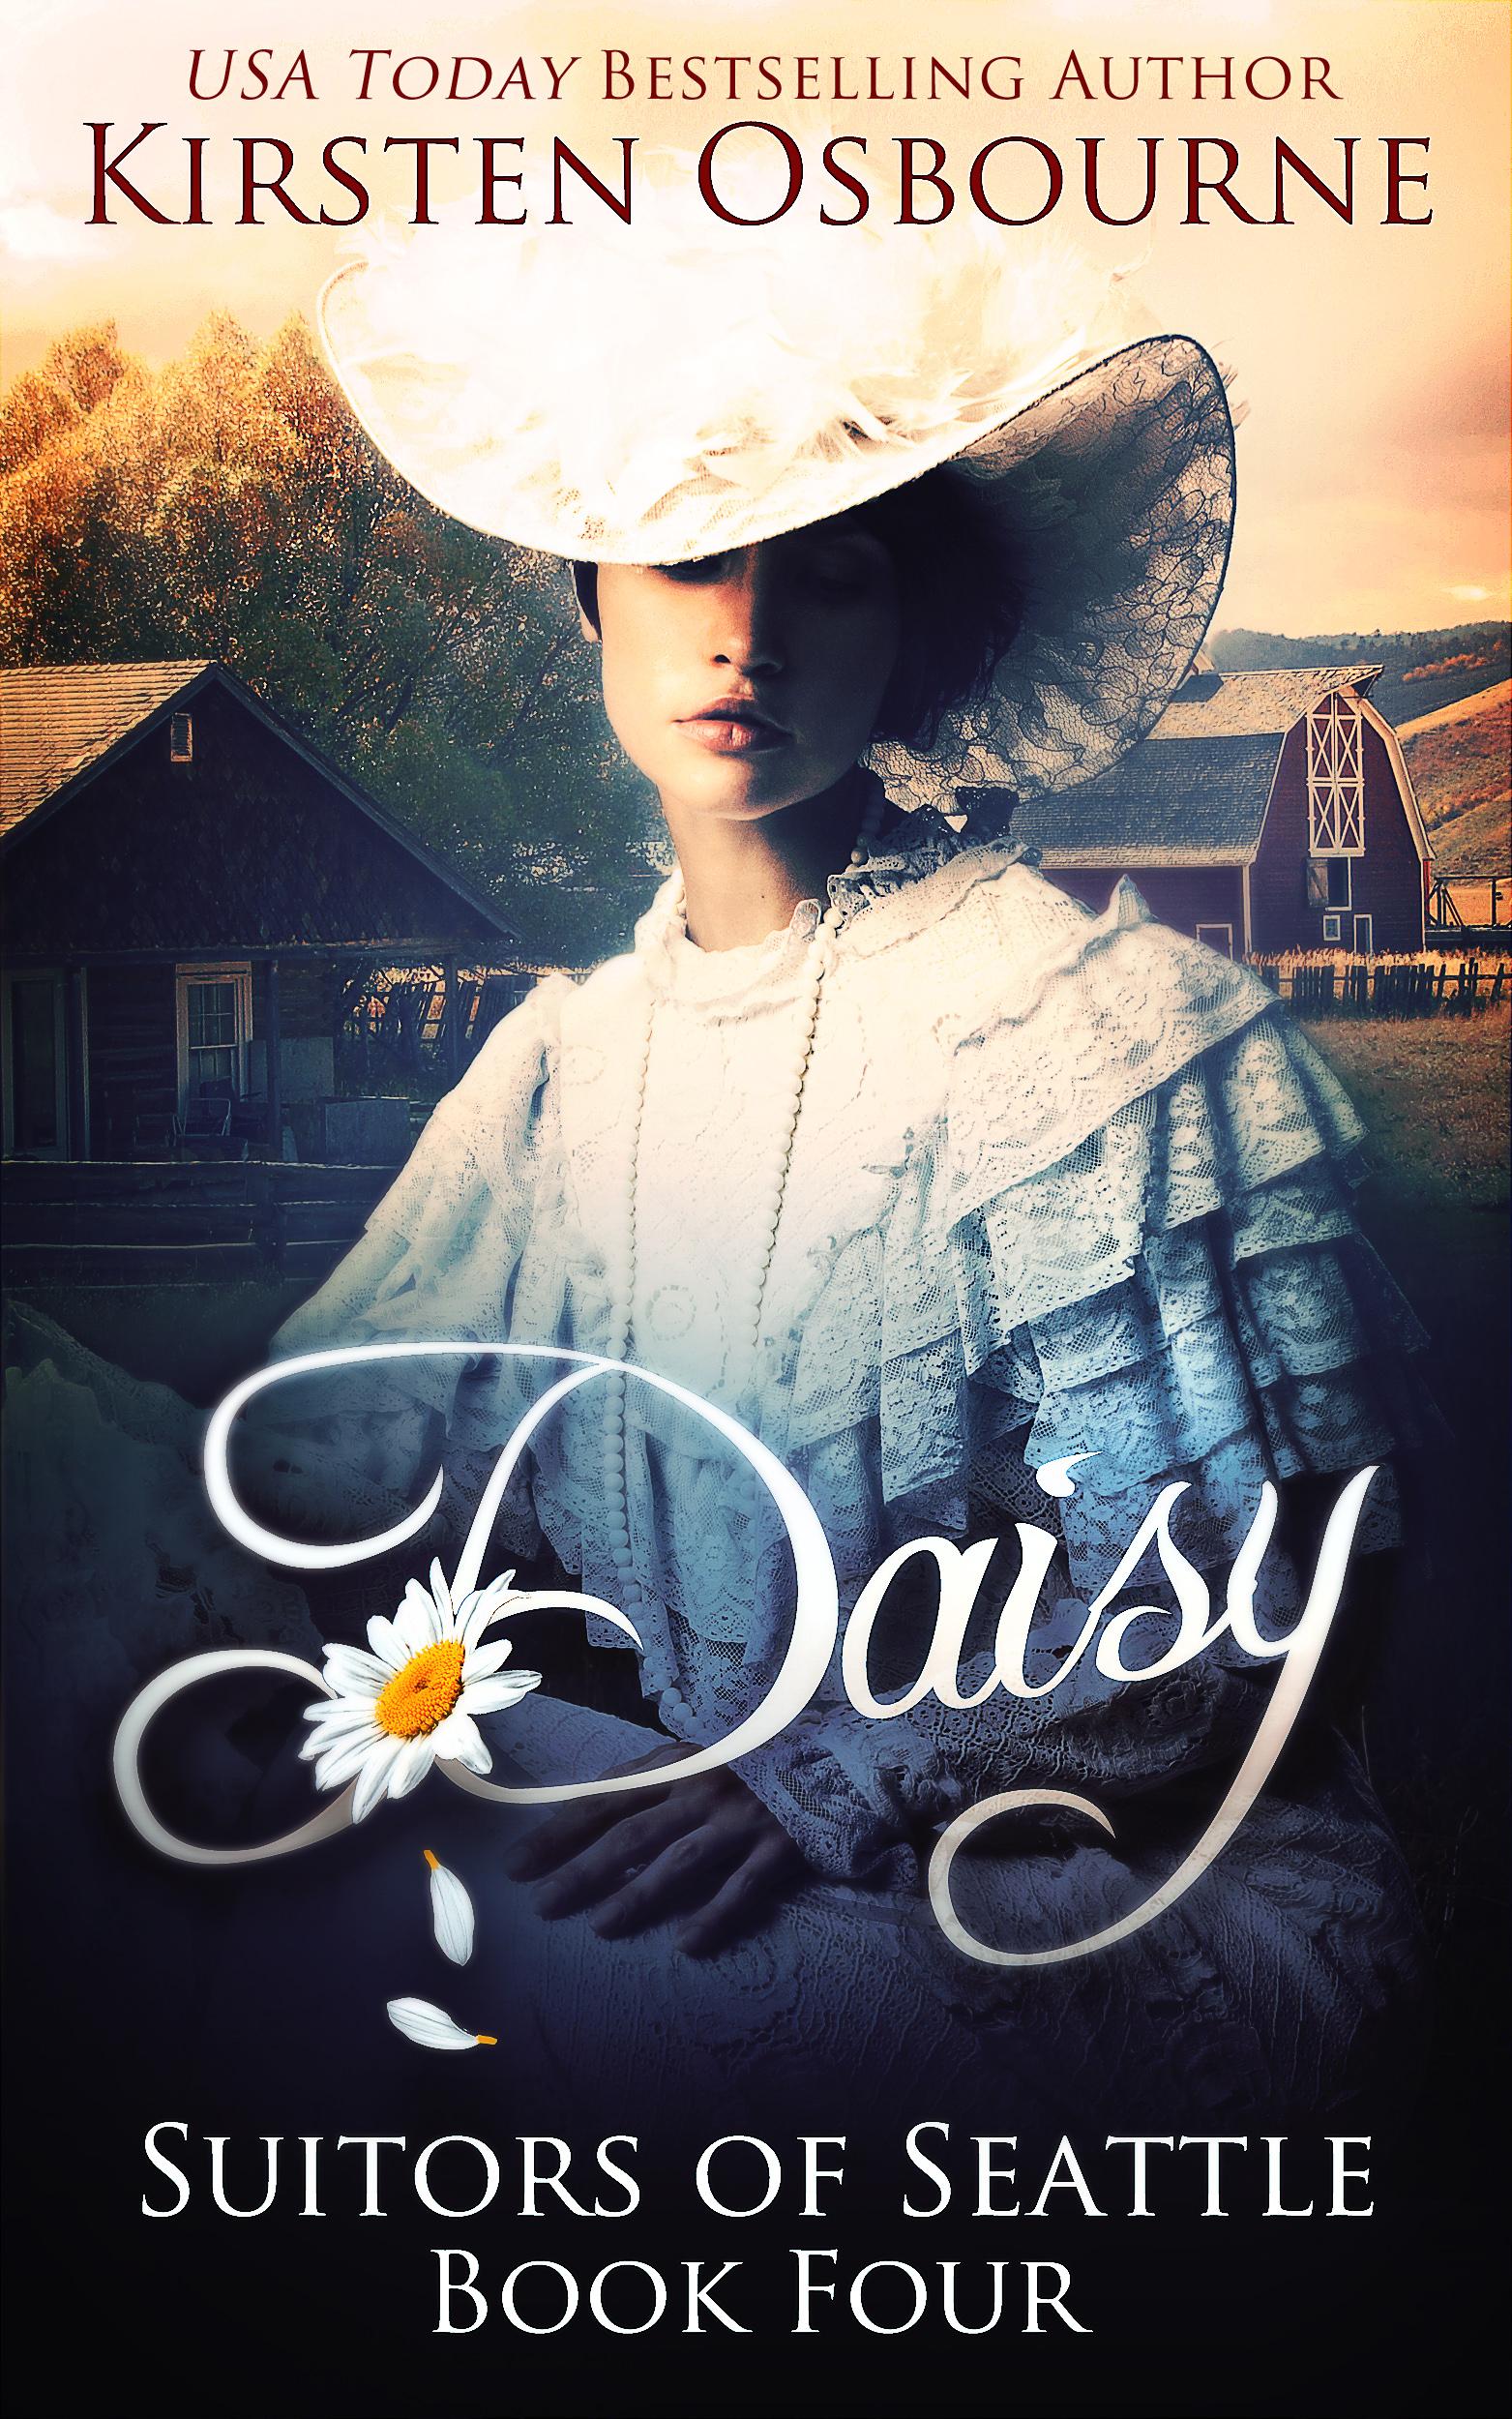 Kirsten Osbourne - Daisy